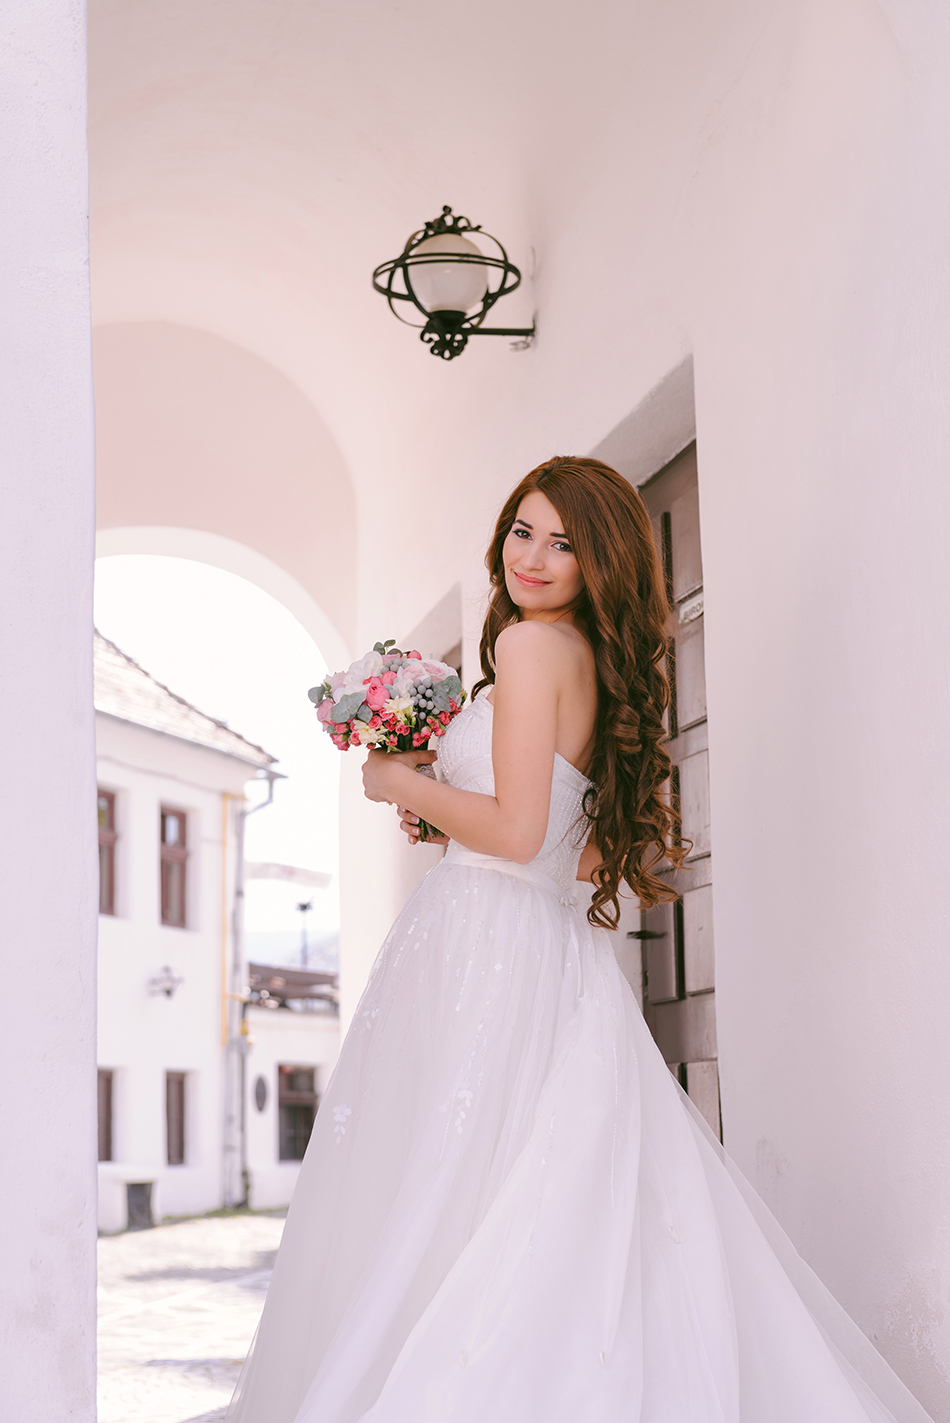 AD Passion Photography | fotograf-nunta-brasov-poiana-brasov-fotograf-profesionist_lorena-cristi_ttd_0019 | Adelin, Dida, fotograf profesionist, fotograf de nunta, fotografie de nunta, fotograf Timisoara, fotograf Craiova, fotograf Bucuresti, fotograf Arad, nunta Timisoara, nunta Arad, nunta Bucuresti, nunta Craiova